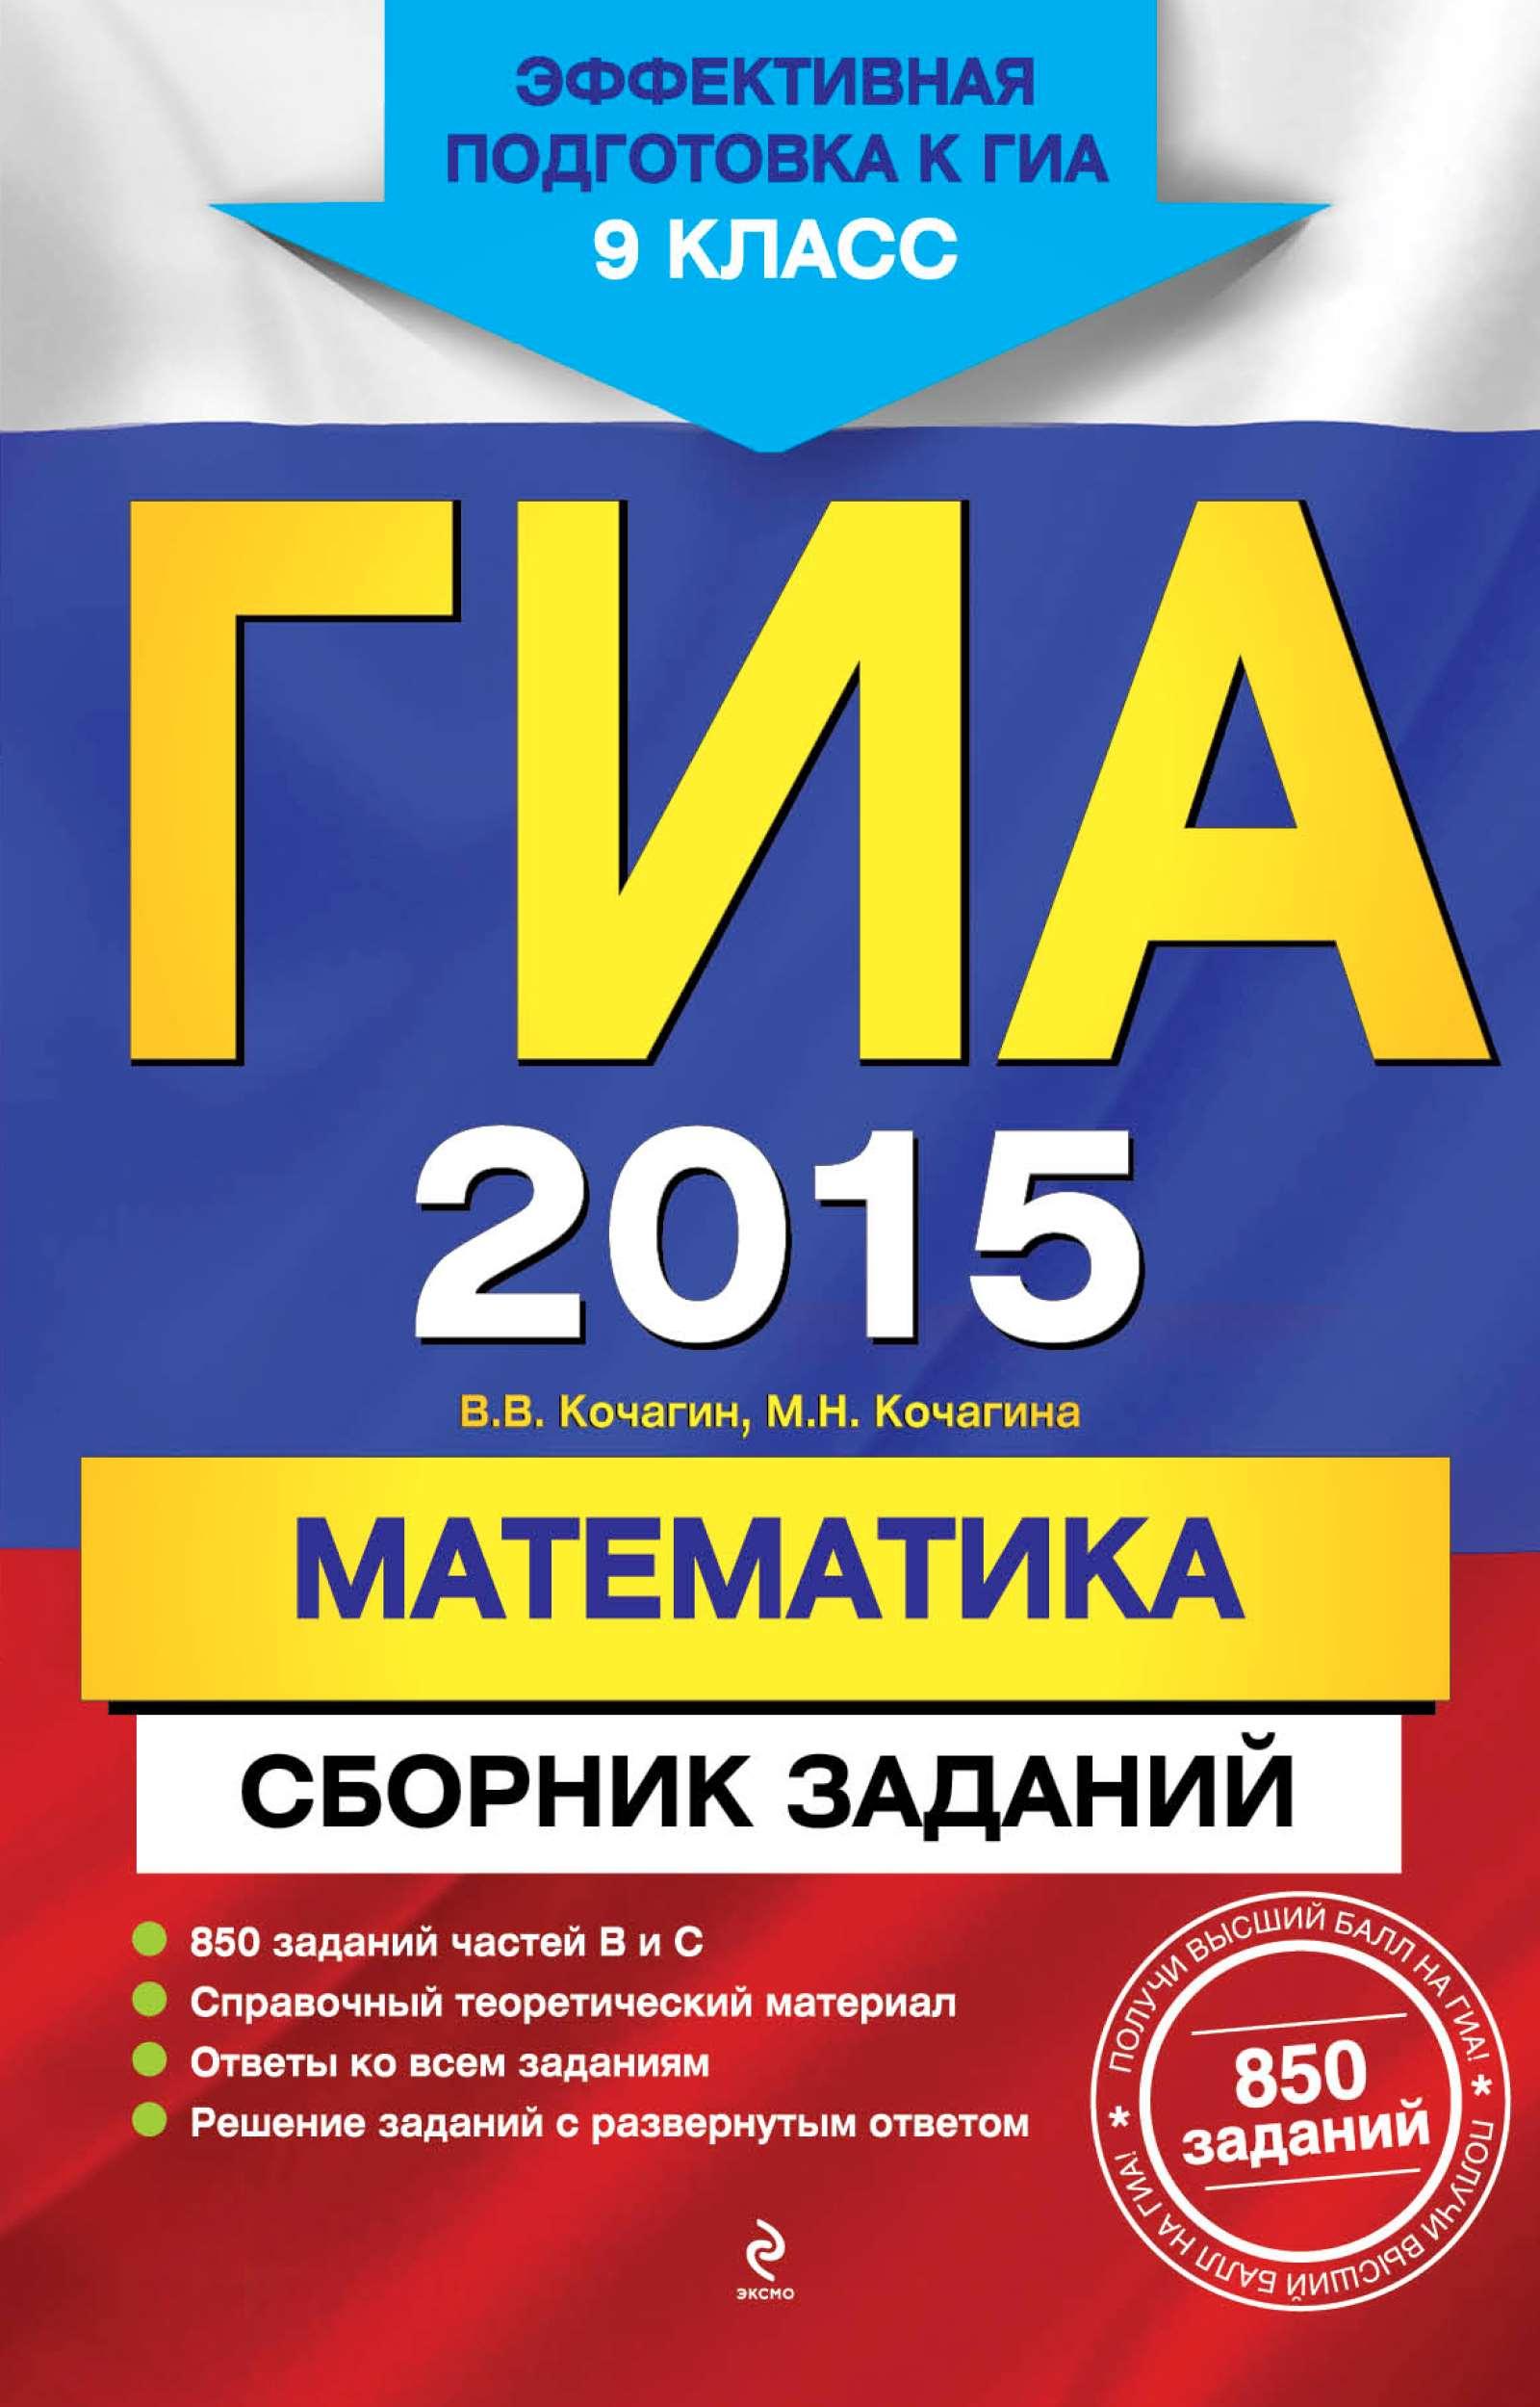 ГИА 2015. Математика. Сборник заданий. 9 класс